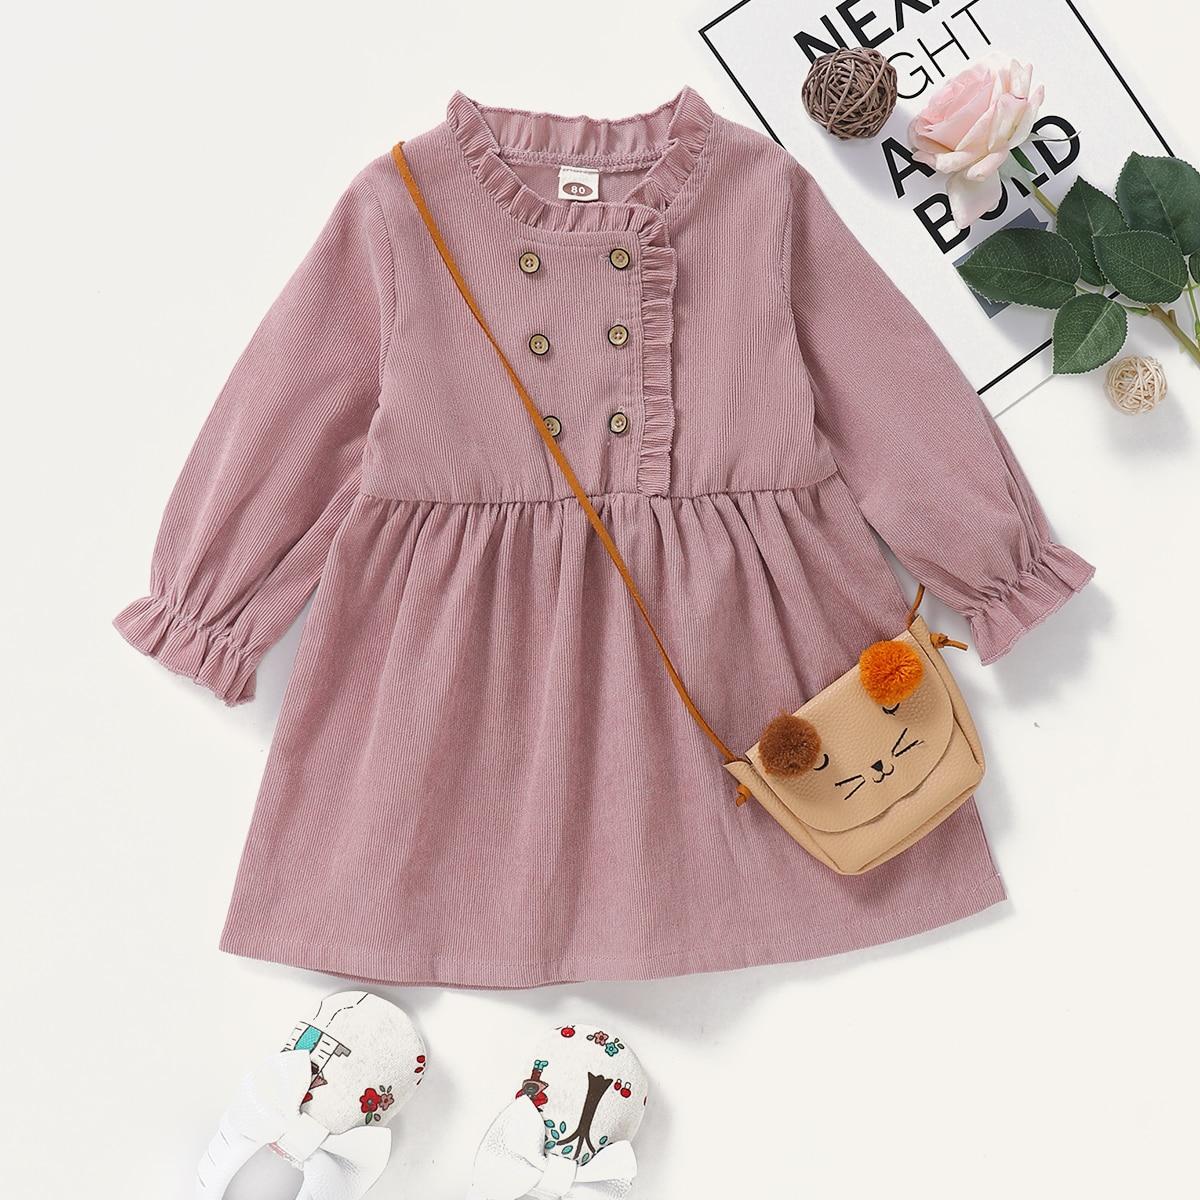 shein Casual Vlak Baby-jurk Rimpeling